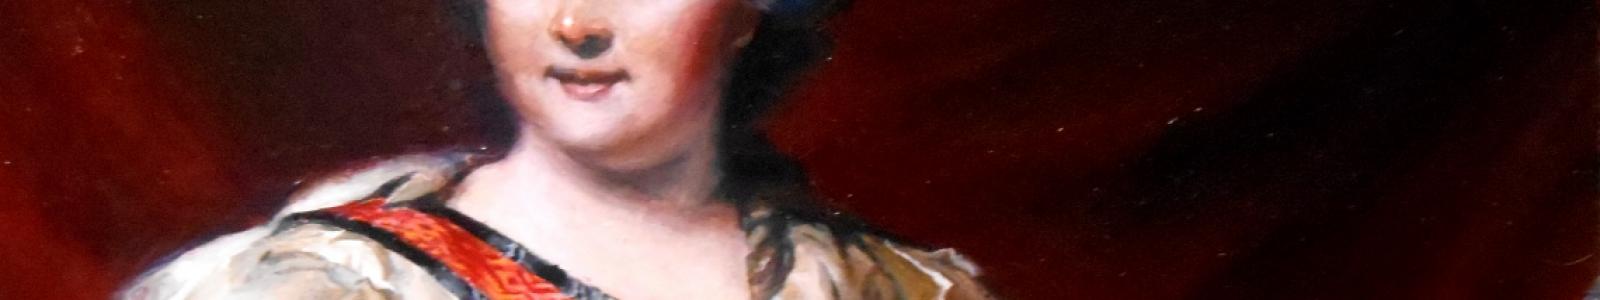 Gallery Painter VIKTOR SAVIN